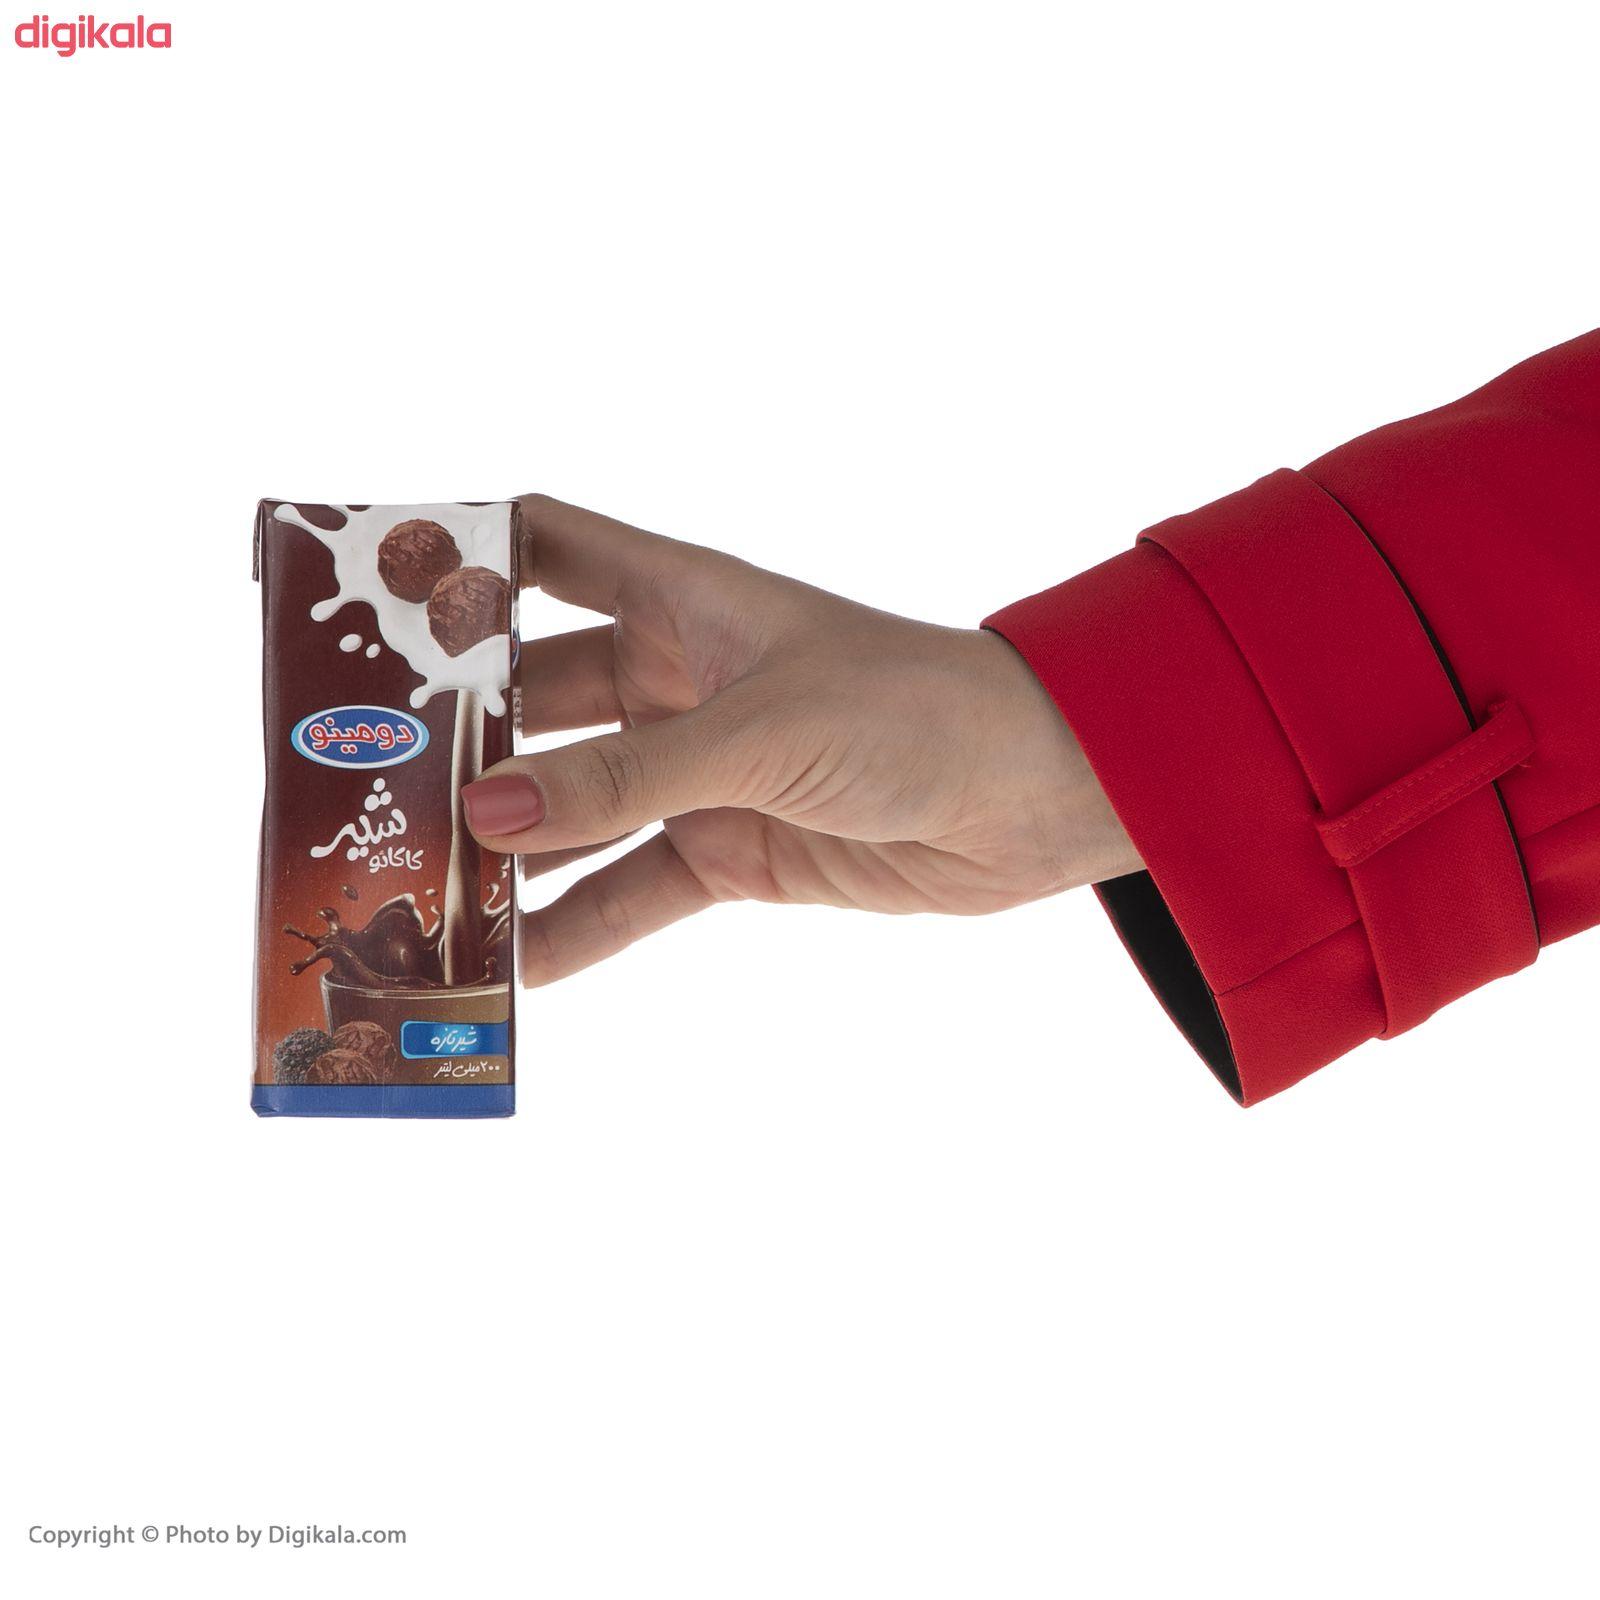 شیر کاکائو دومینو - 0.2 لیتر بسته 6 عددی main 1 7